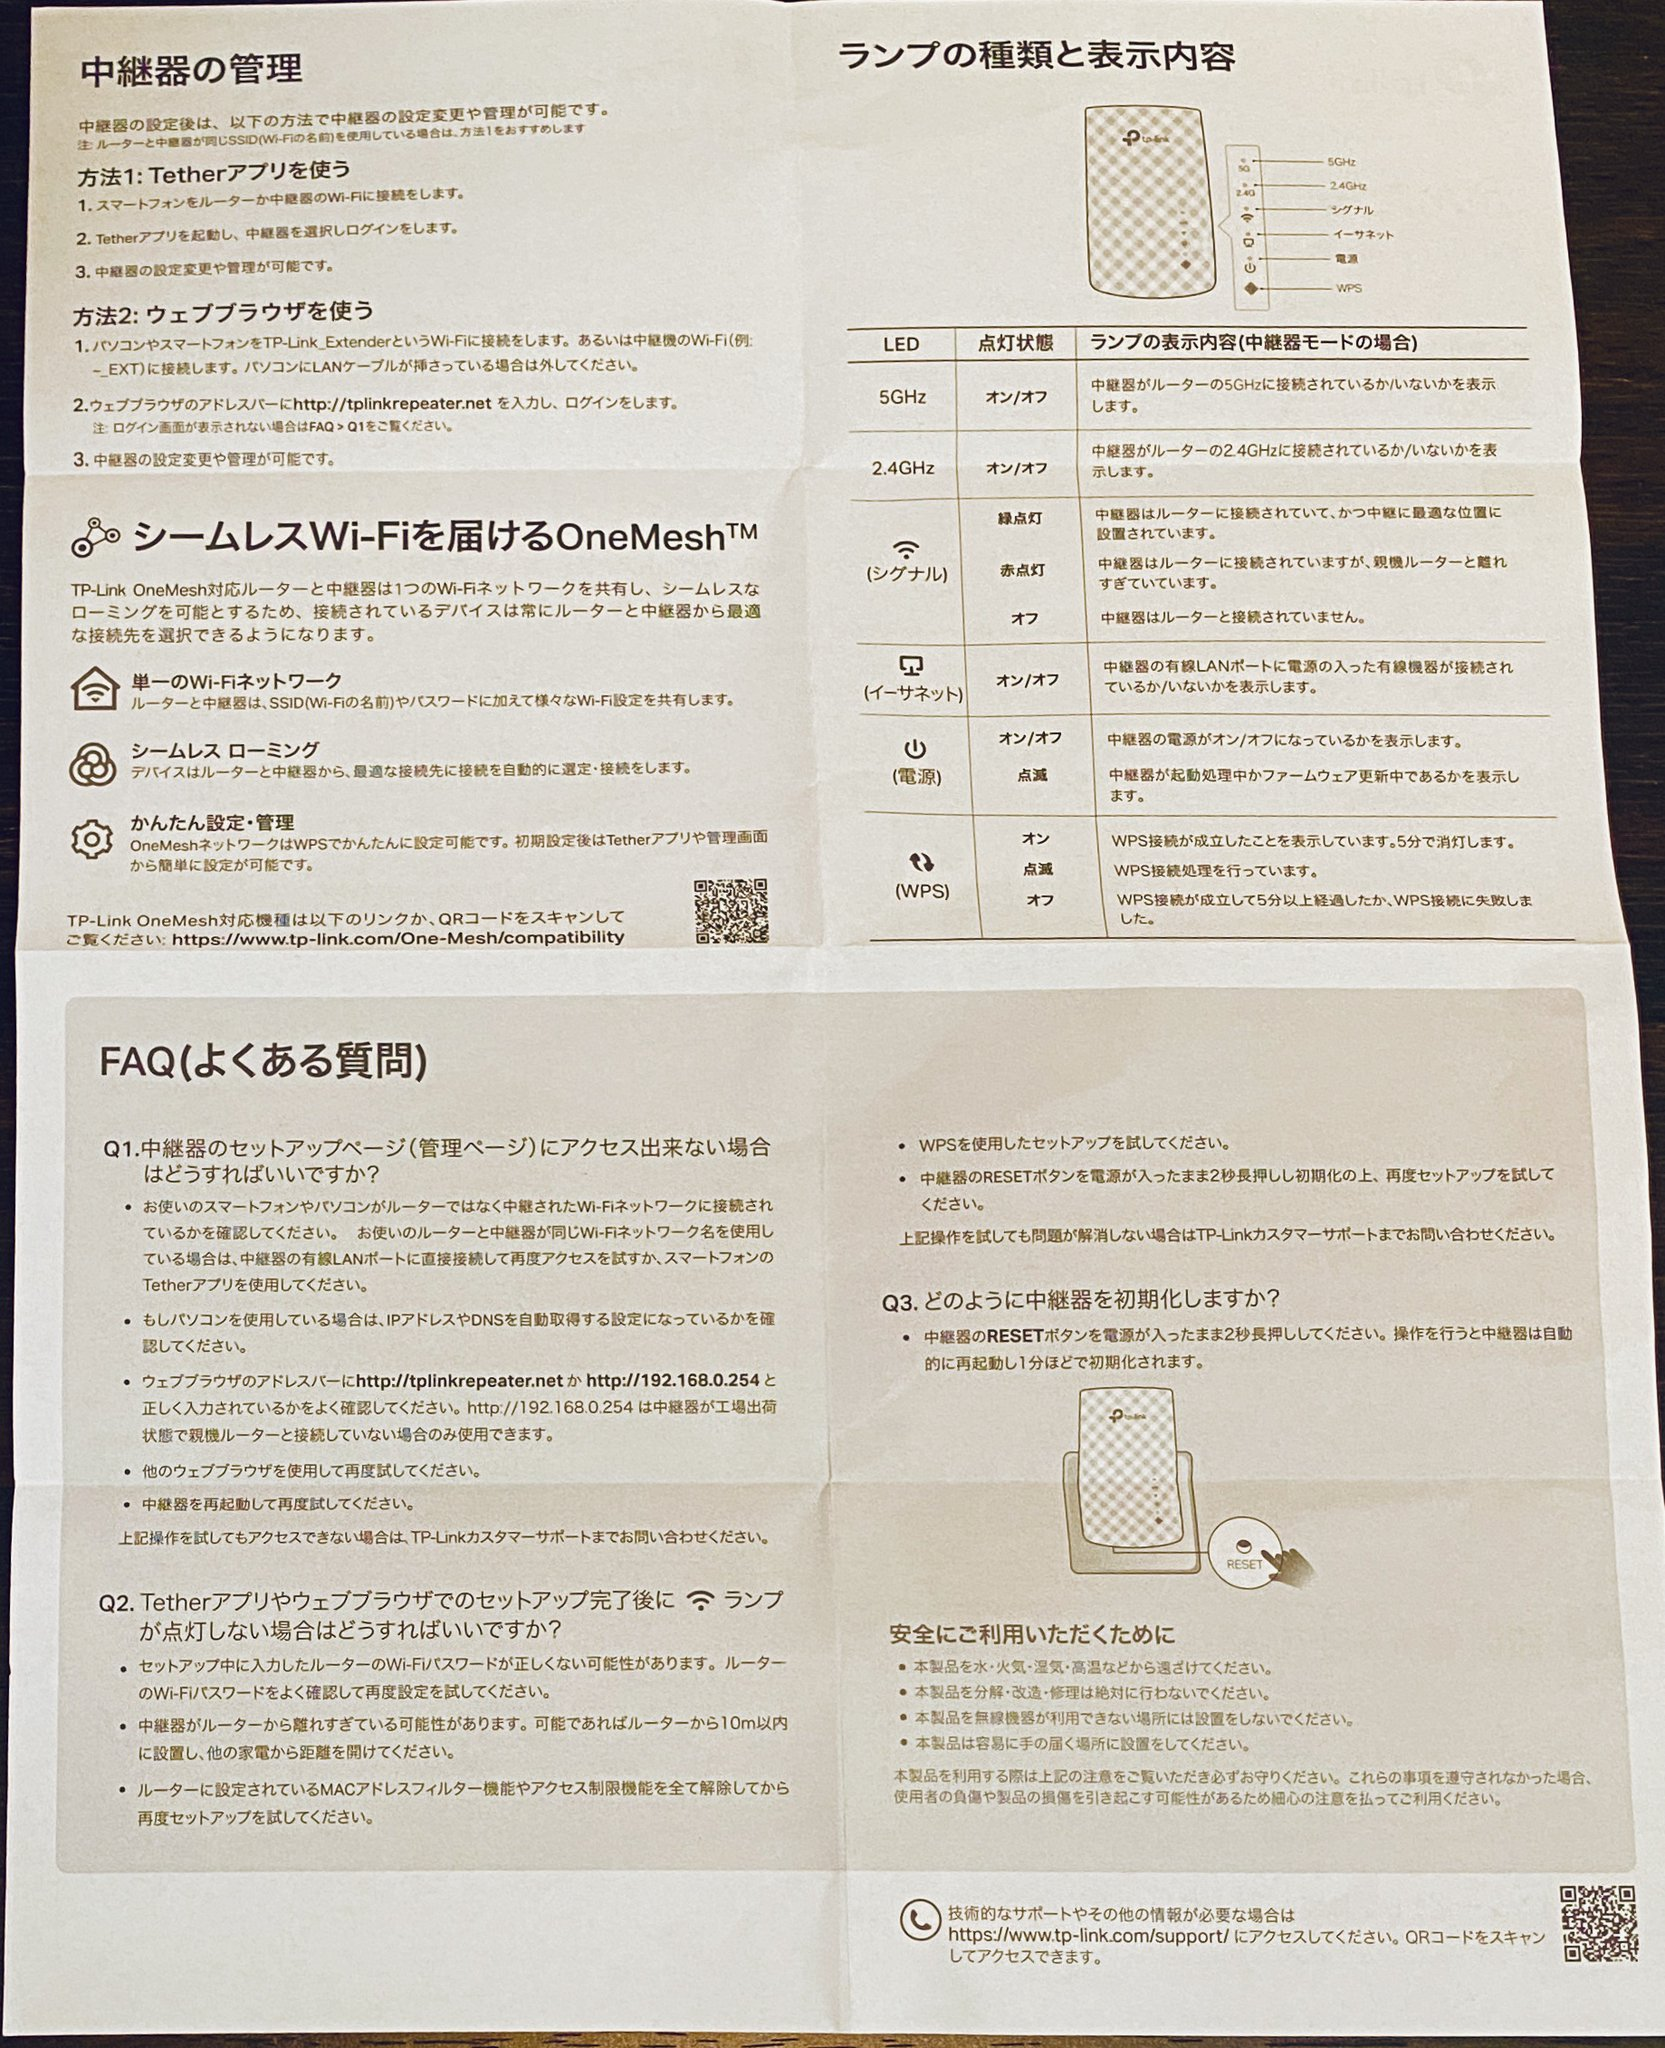 TP-Link RE200 AC750 Wi-Fi 中継器 説明書 https://t.co/H5XrNkhYNA